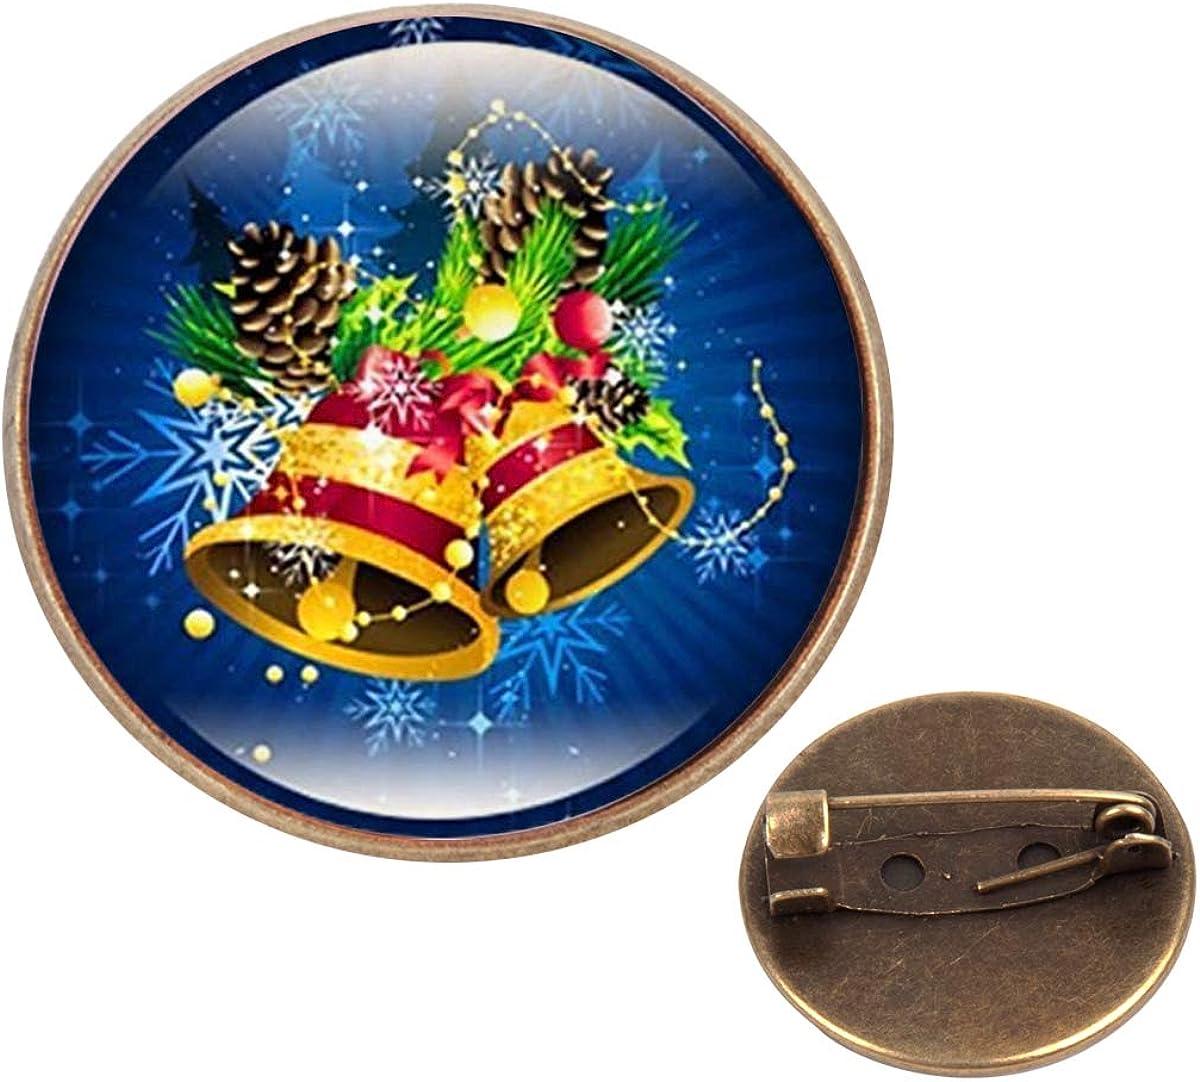 Pinback Buttons Badges Pins Christmas Bell Art Lapel Pin Brooch Clip Trendy Accessory Jacket T-Shirt Bag Hat Shoe